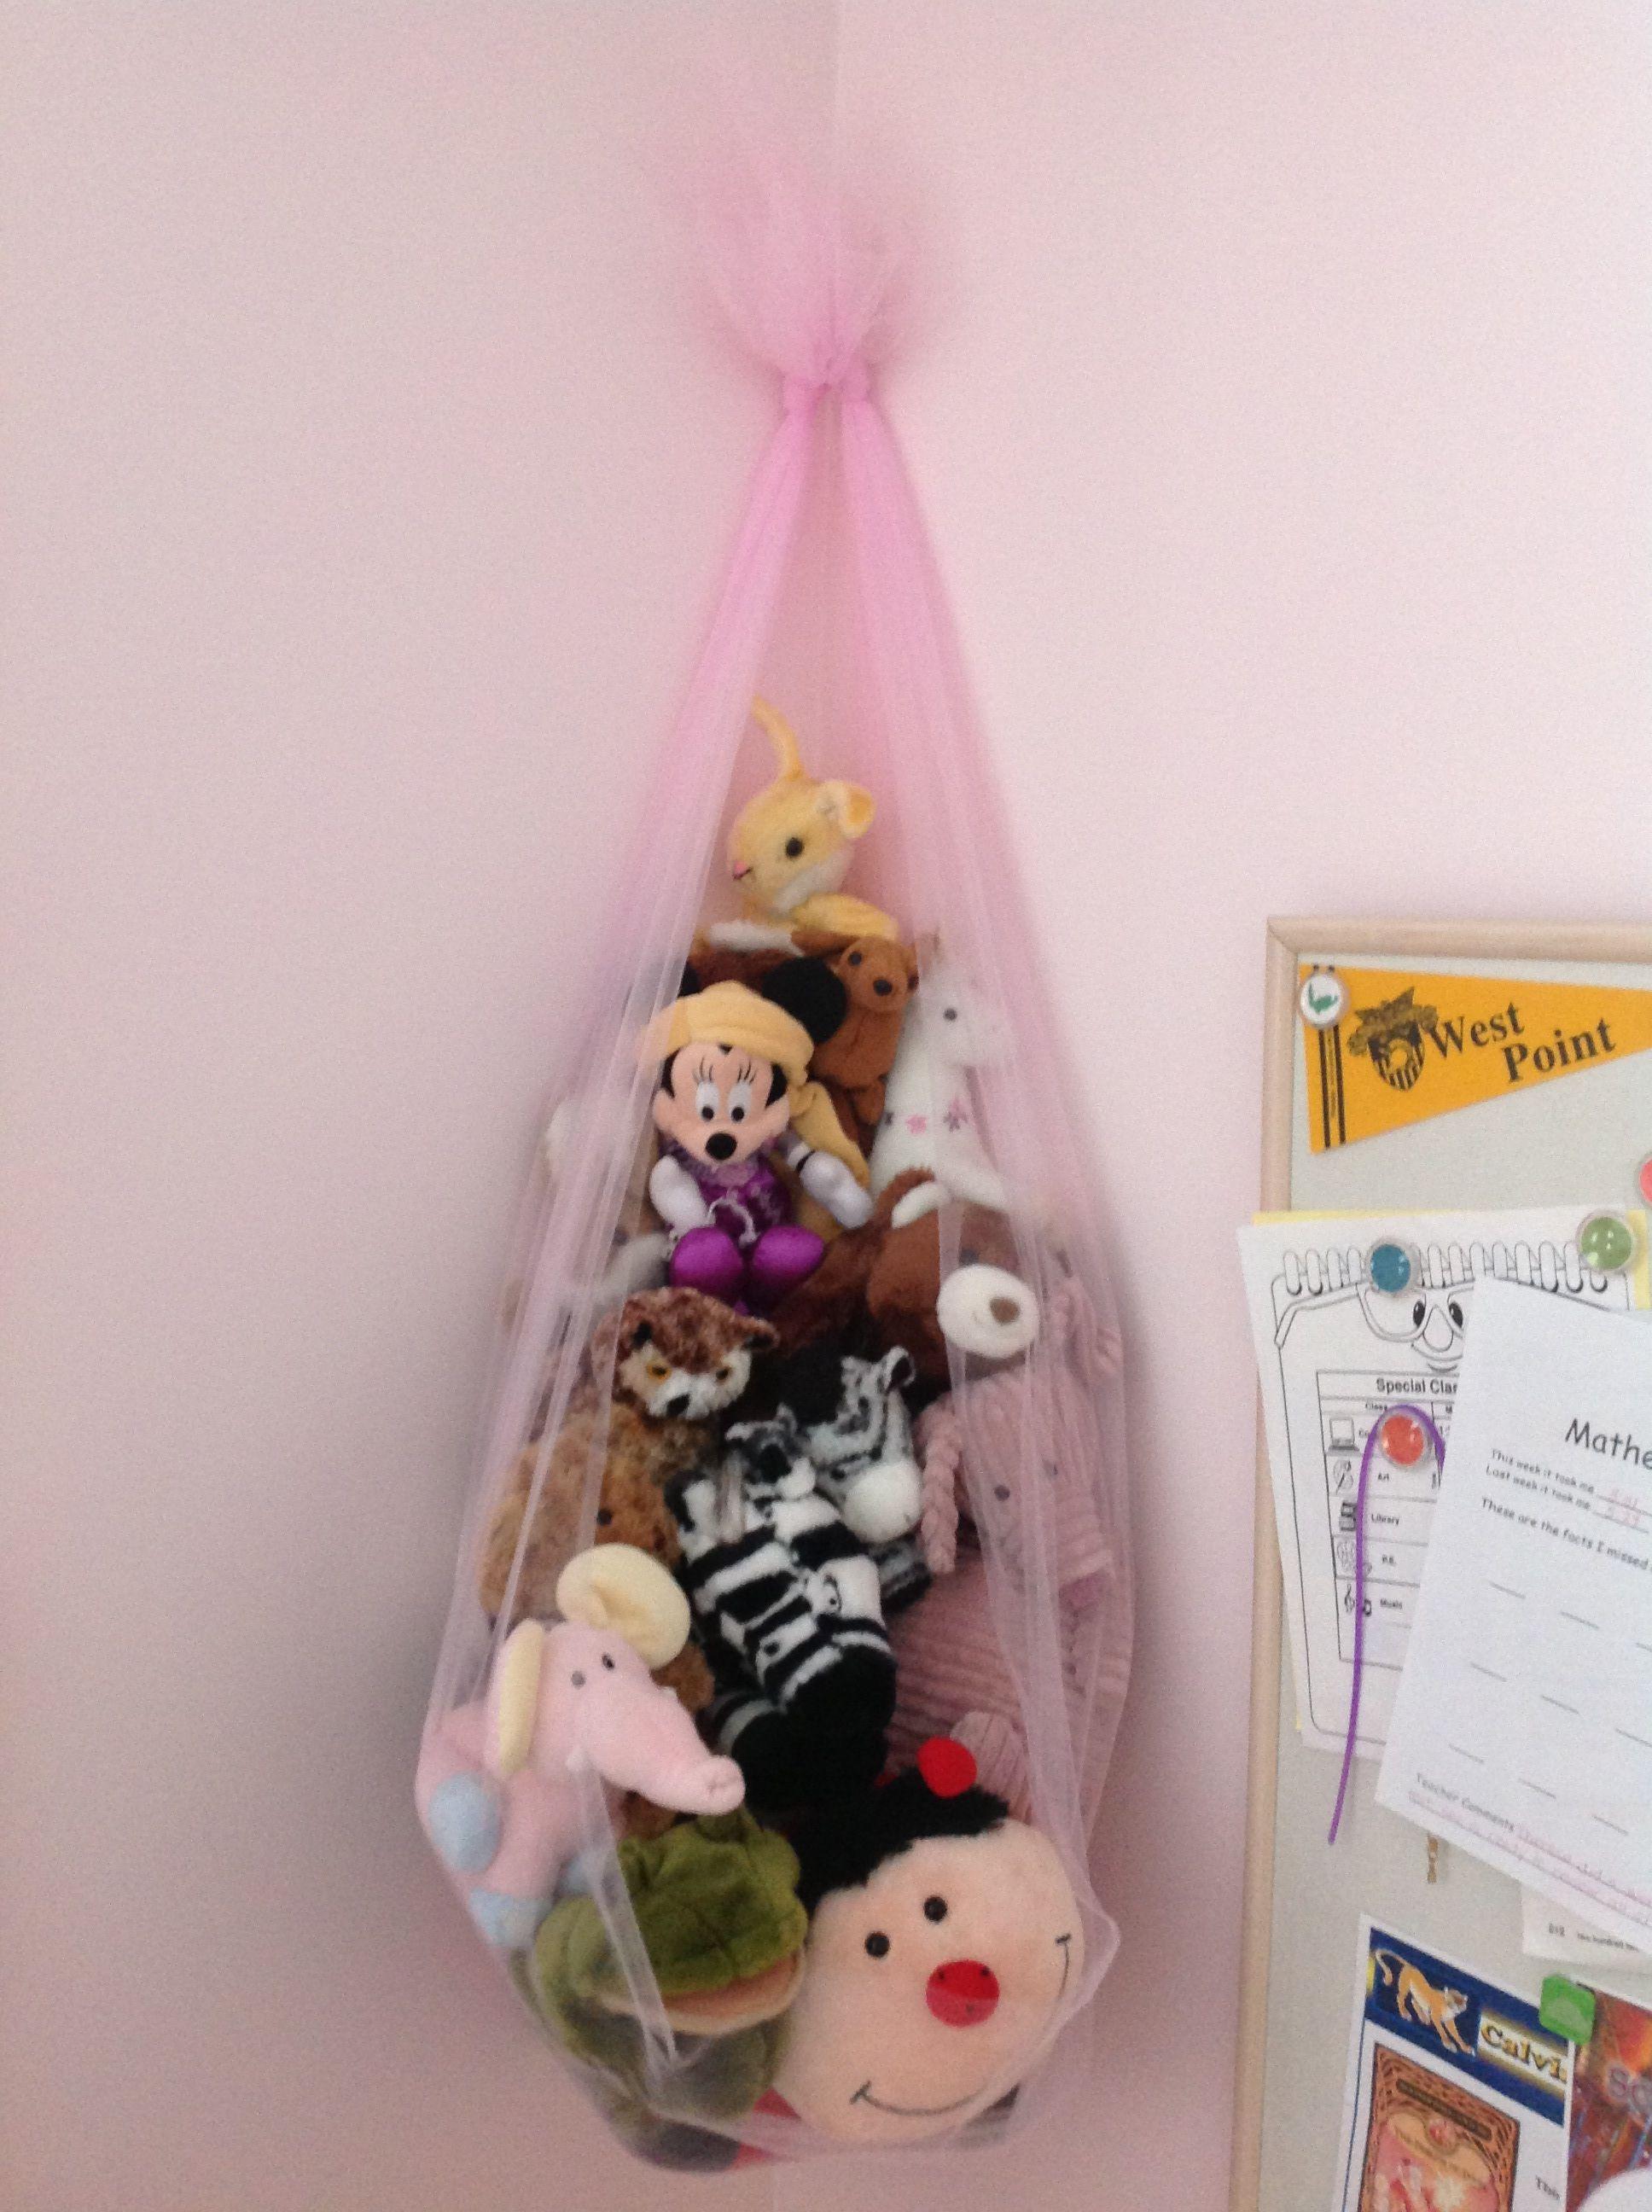 Pin By Elizabeth Briggs On Things I Made Stuffed Animal Storage Organizing Stuffed Animals Stuffed Animal Holder